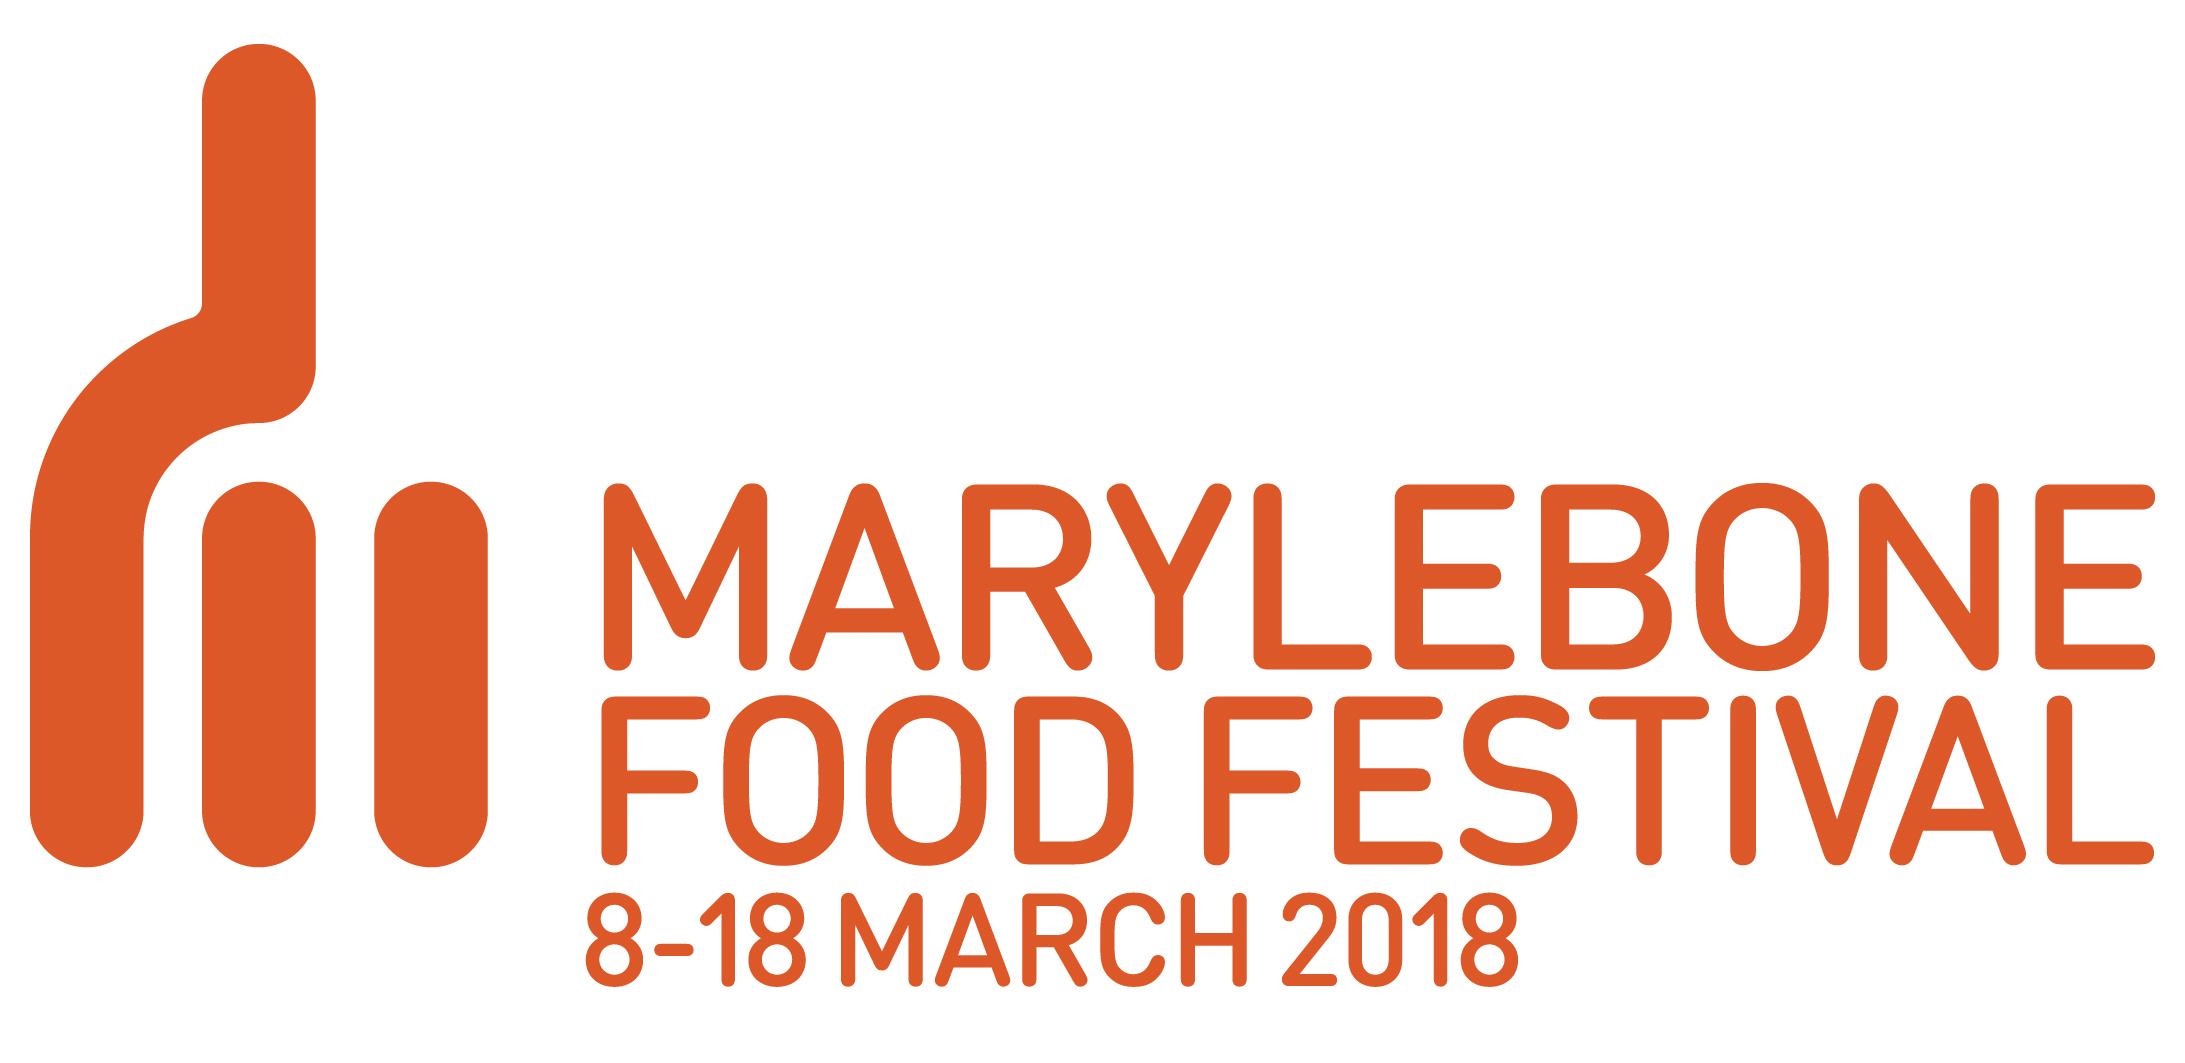 MaryleboneFoodFestival-ORANGE-RGB copy.jpg